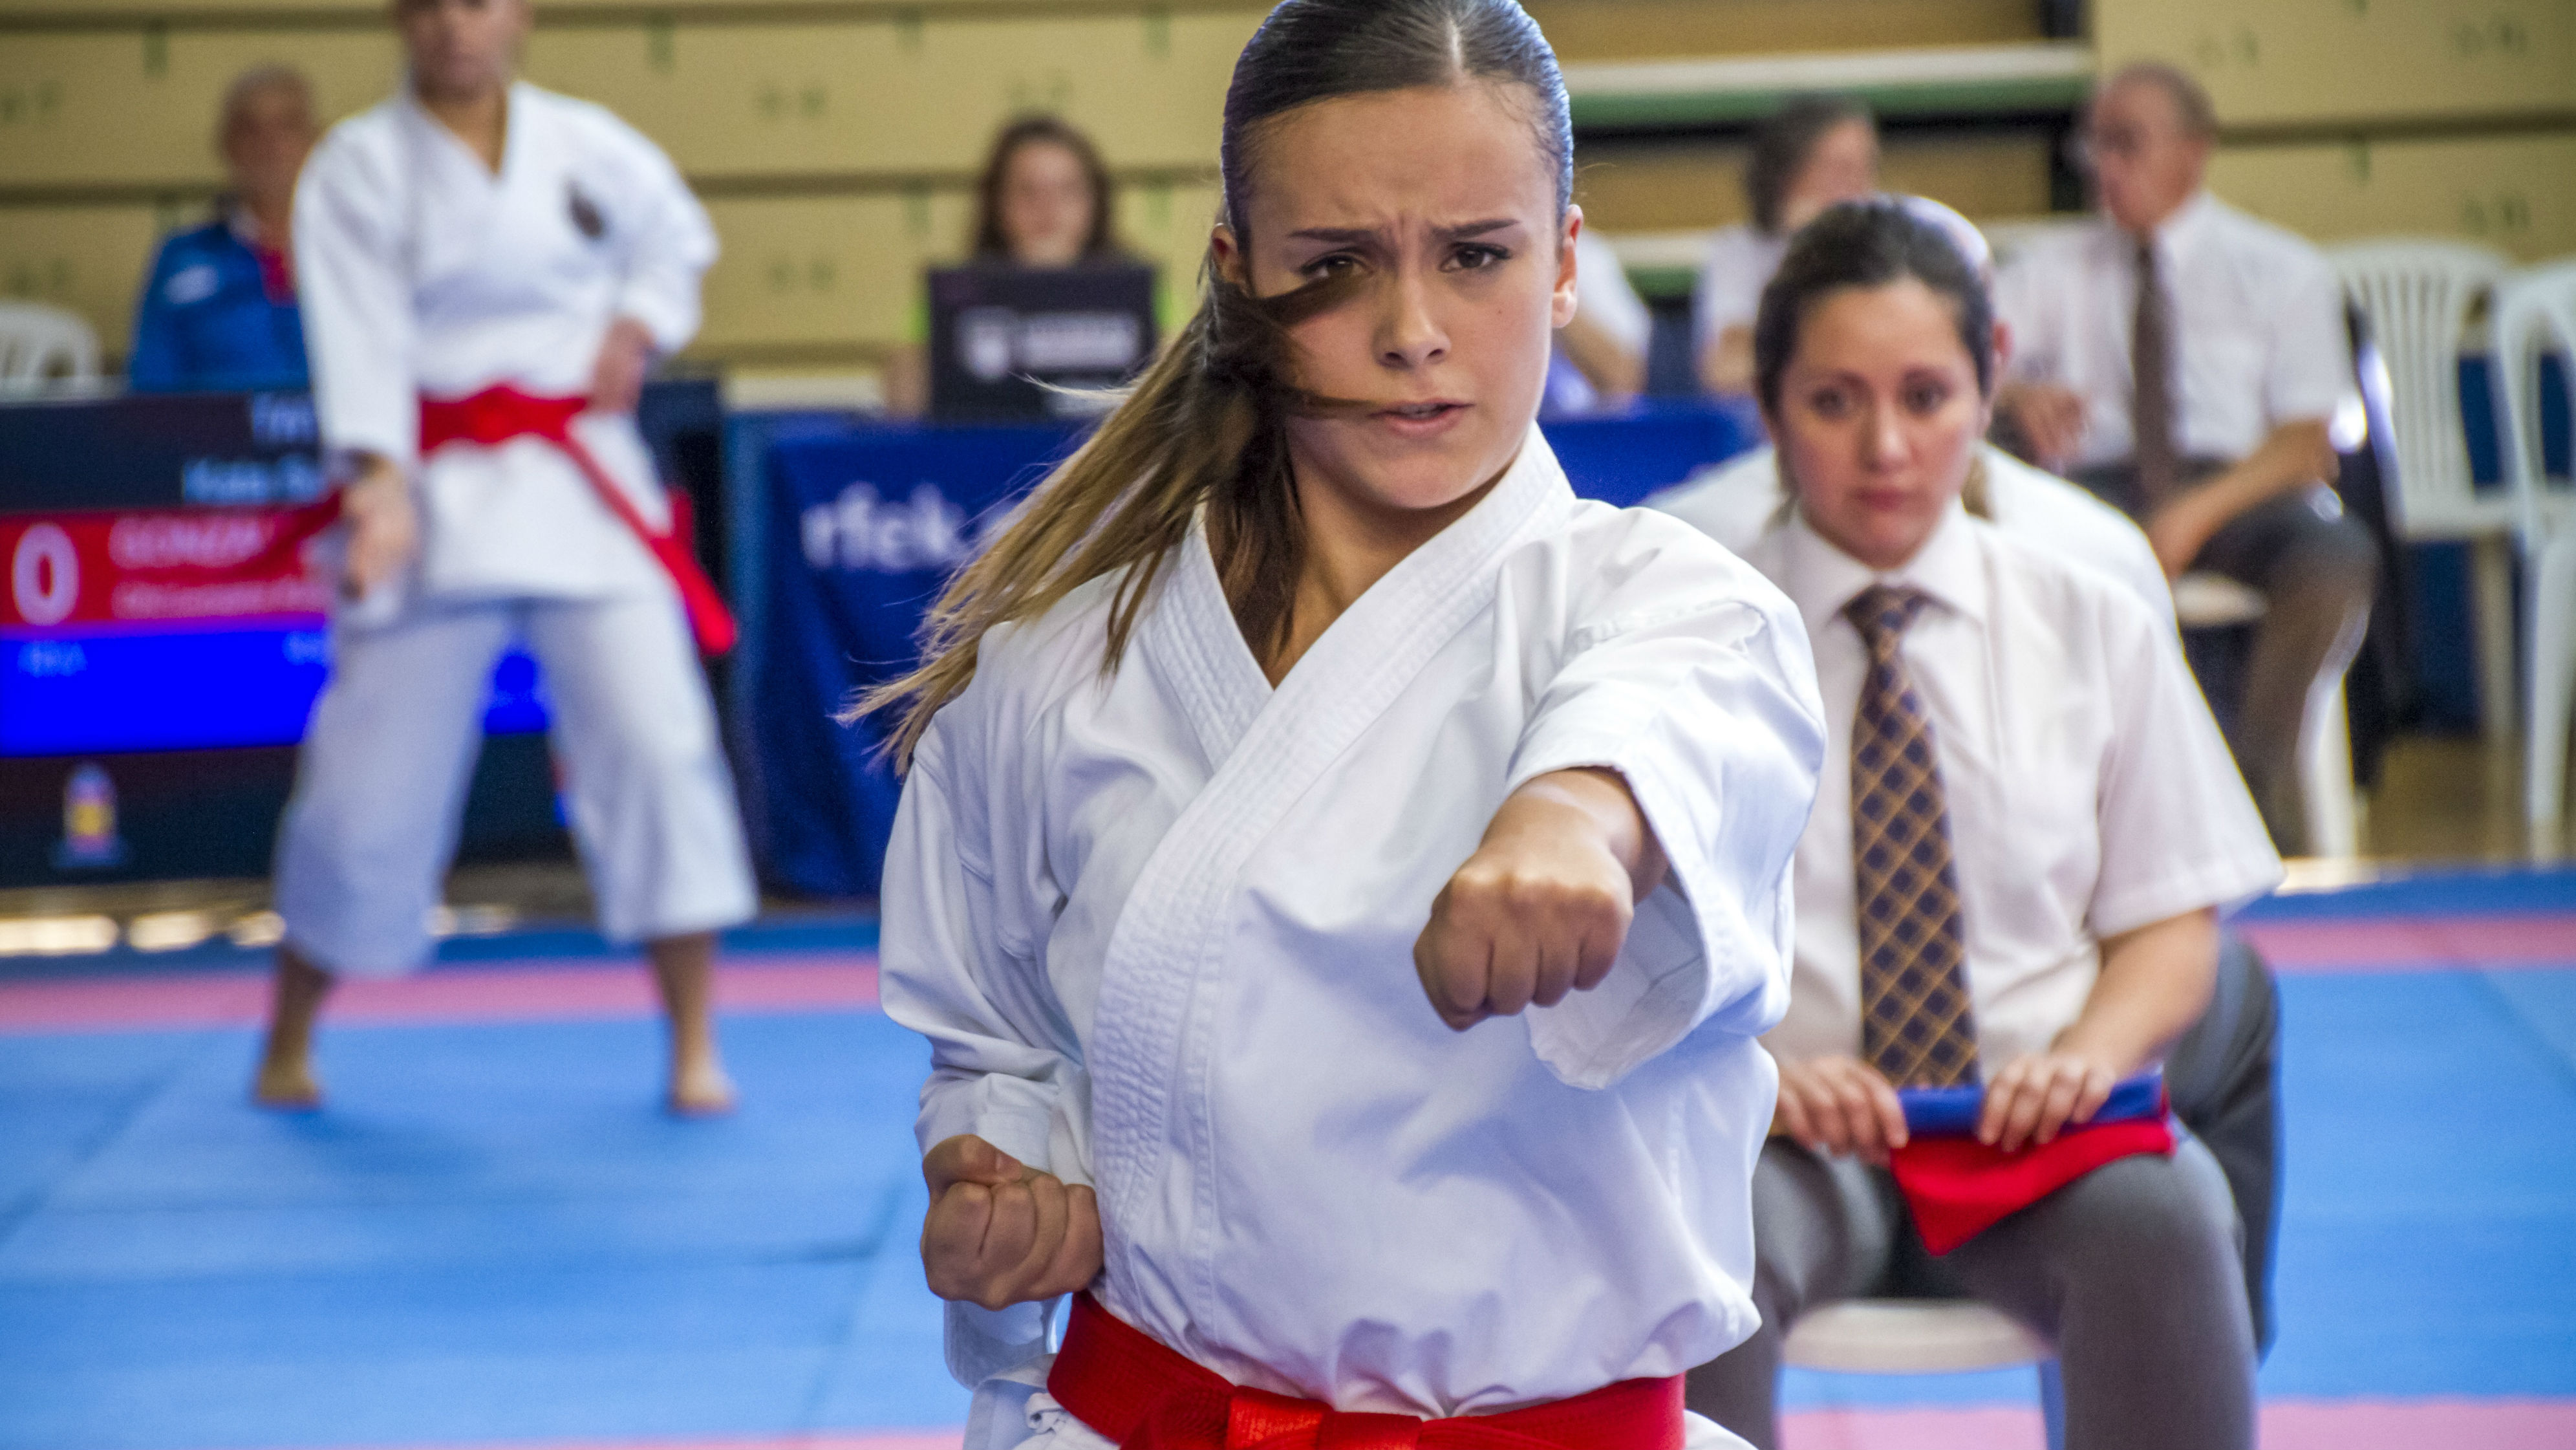 Liga Nacional Femenina Iberdrola de Kárate junior y sub 21